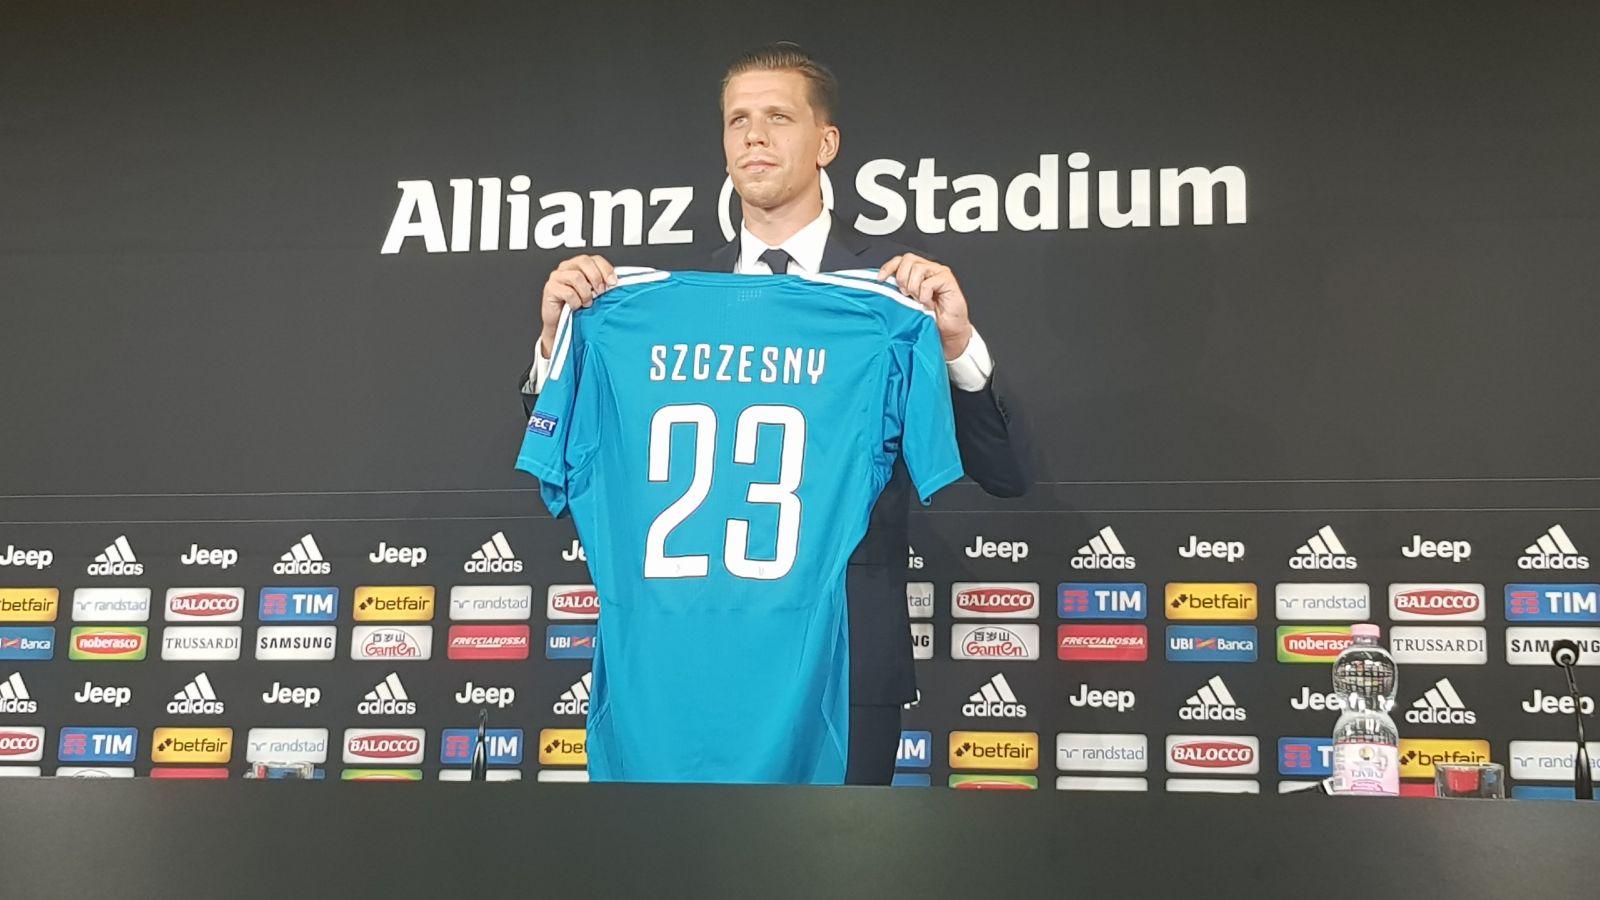 Juventus Seal €12m Szeczesny Deal From Arsenal